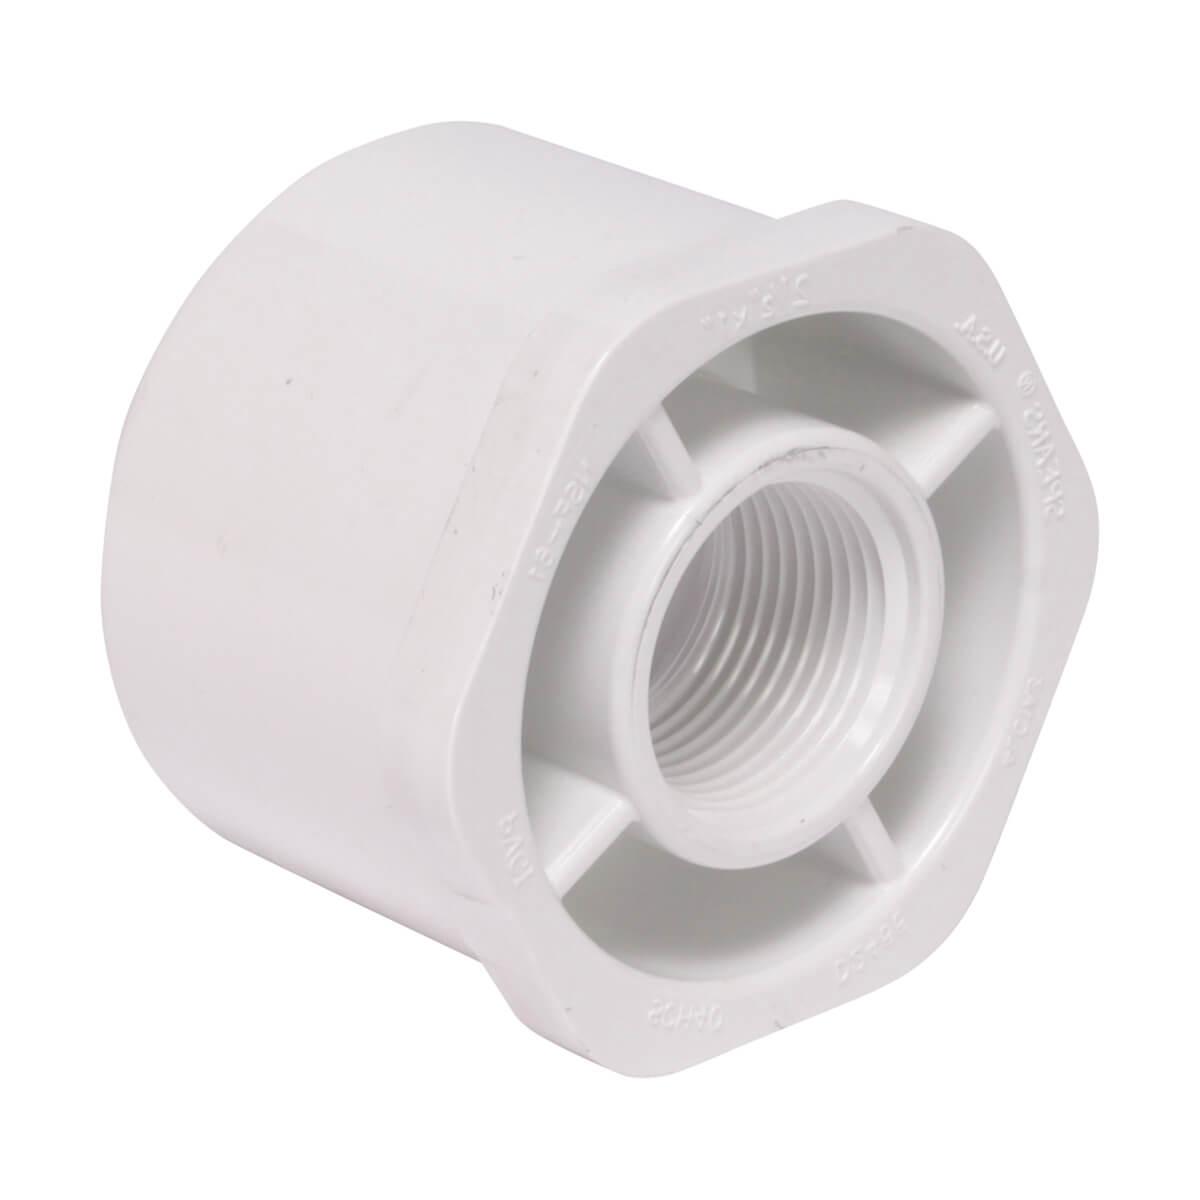 Reducer Bushing - Spigot X FPT - 1-in x 3/4-in